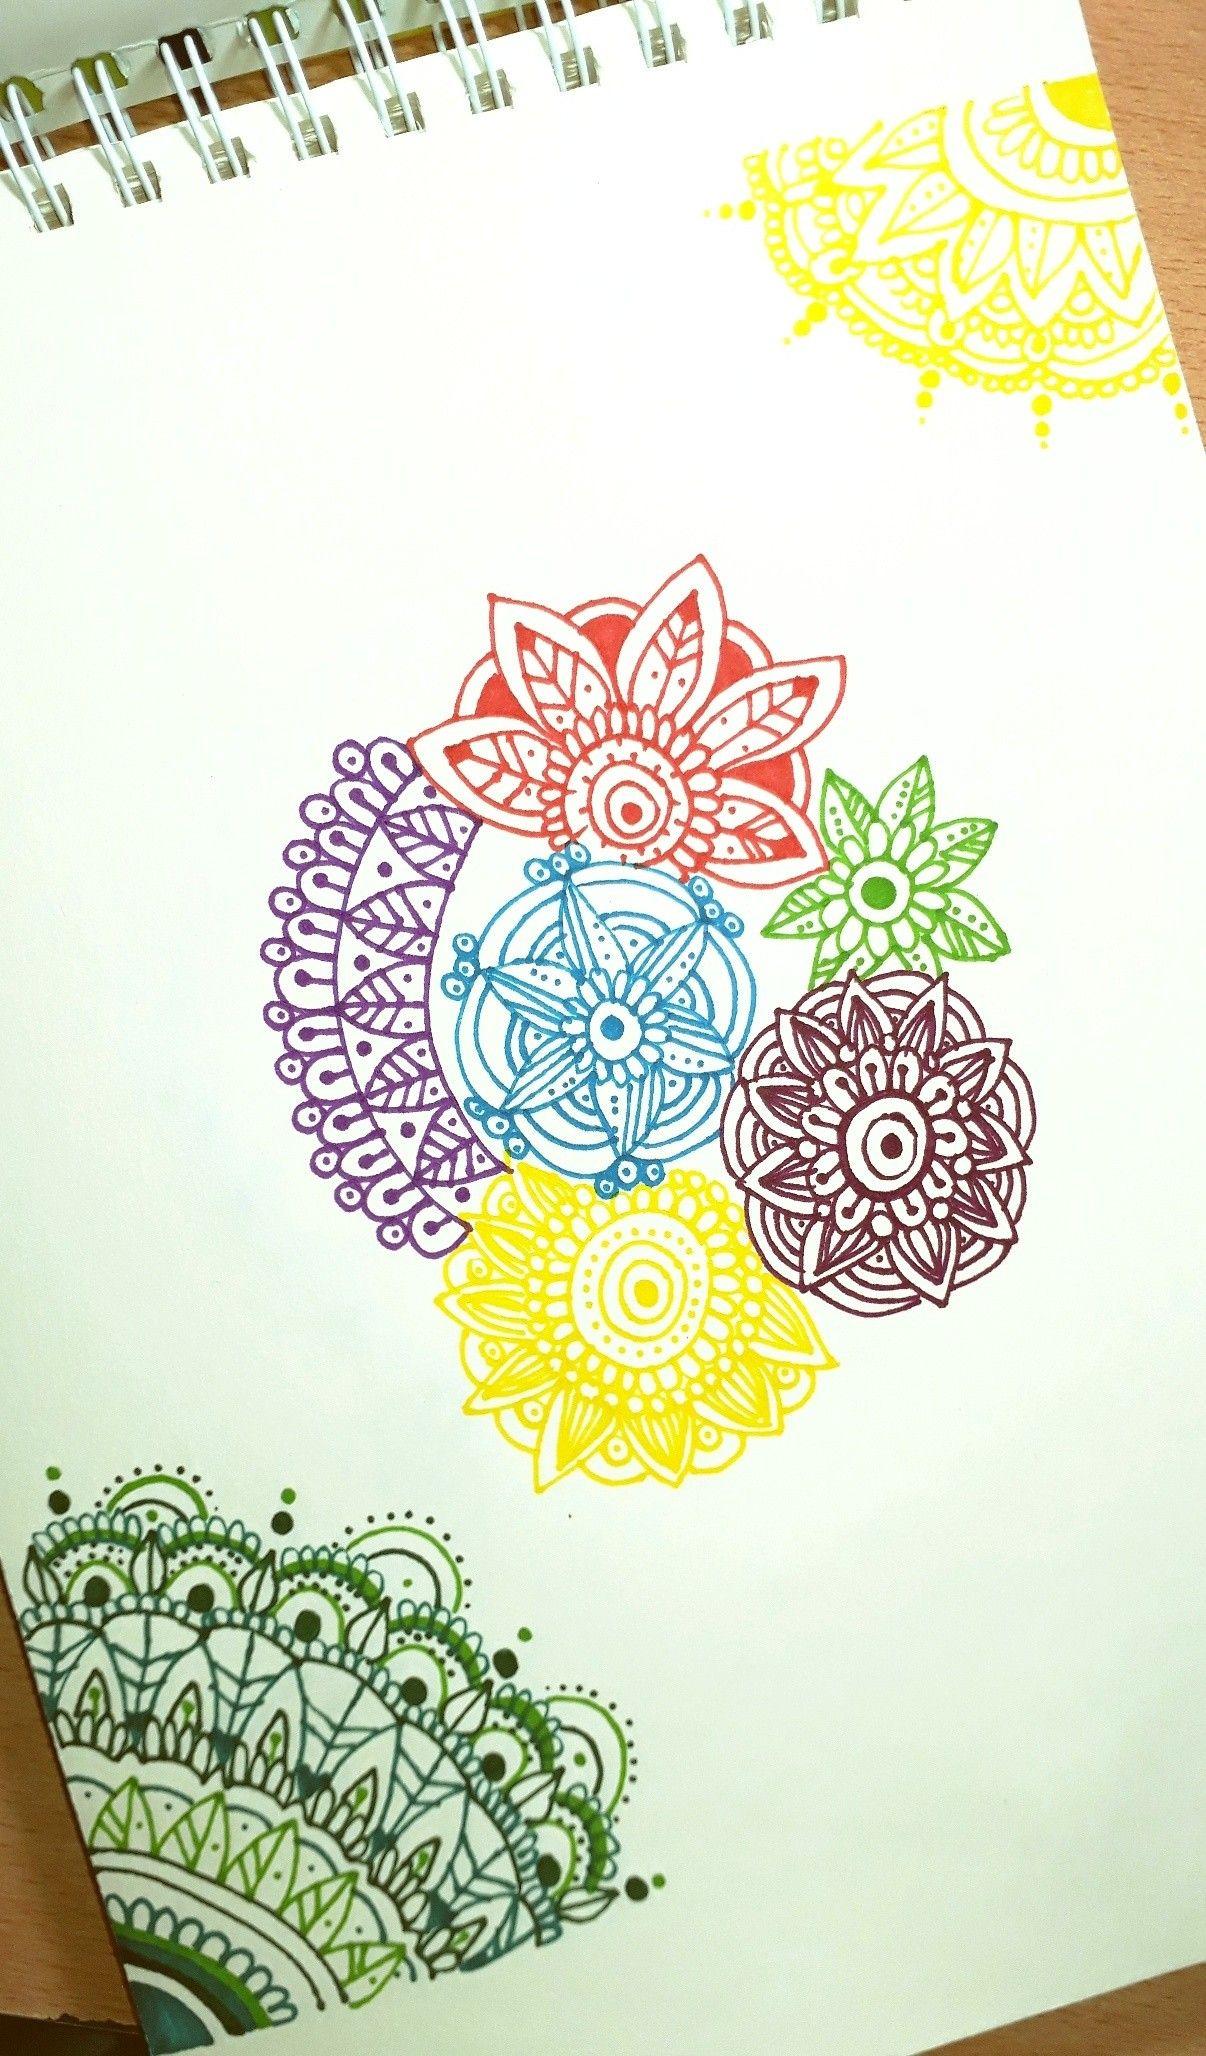 Pin by josephine brunetta on doodling draw ideas in pinterest